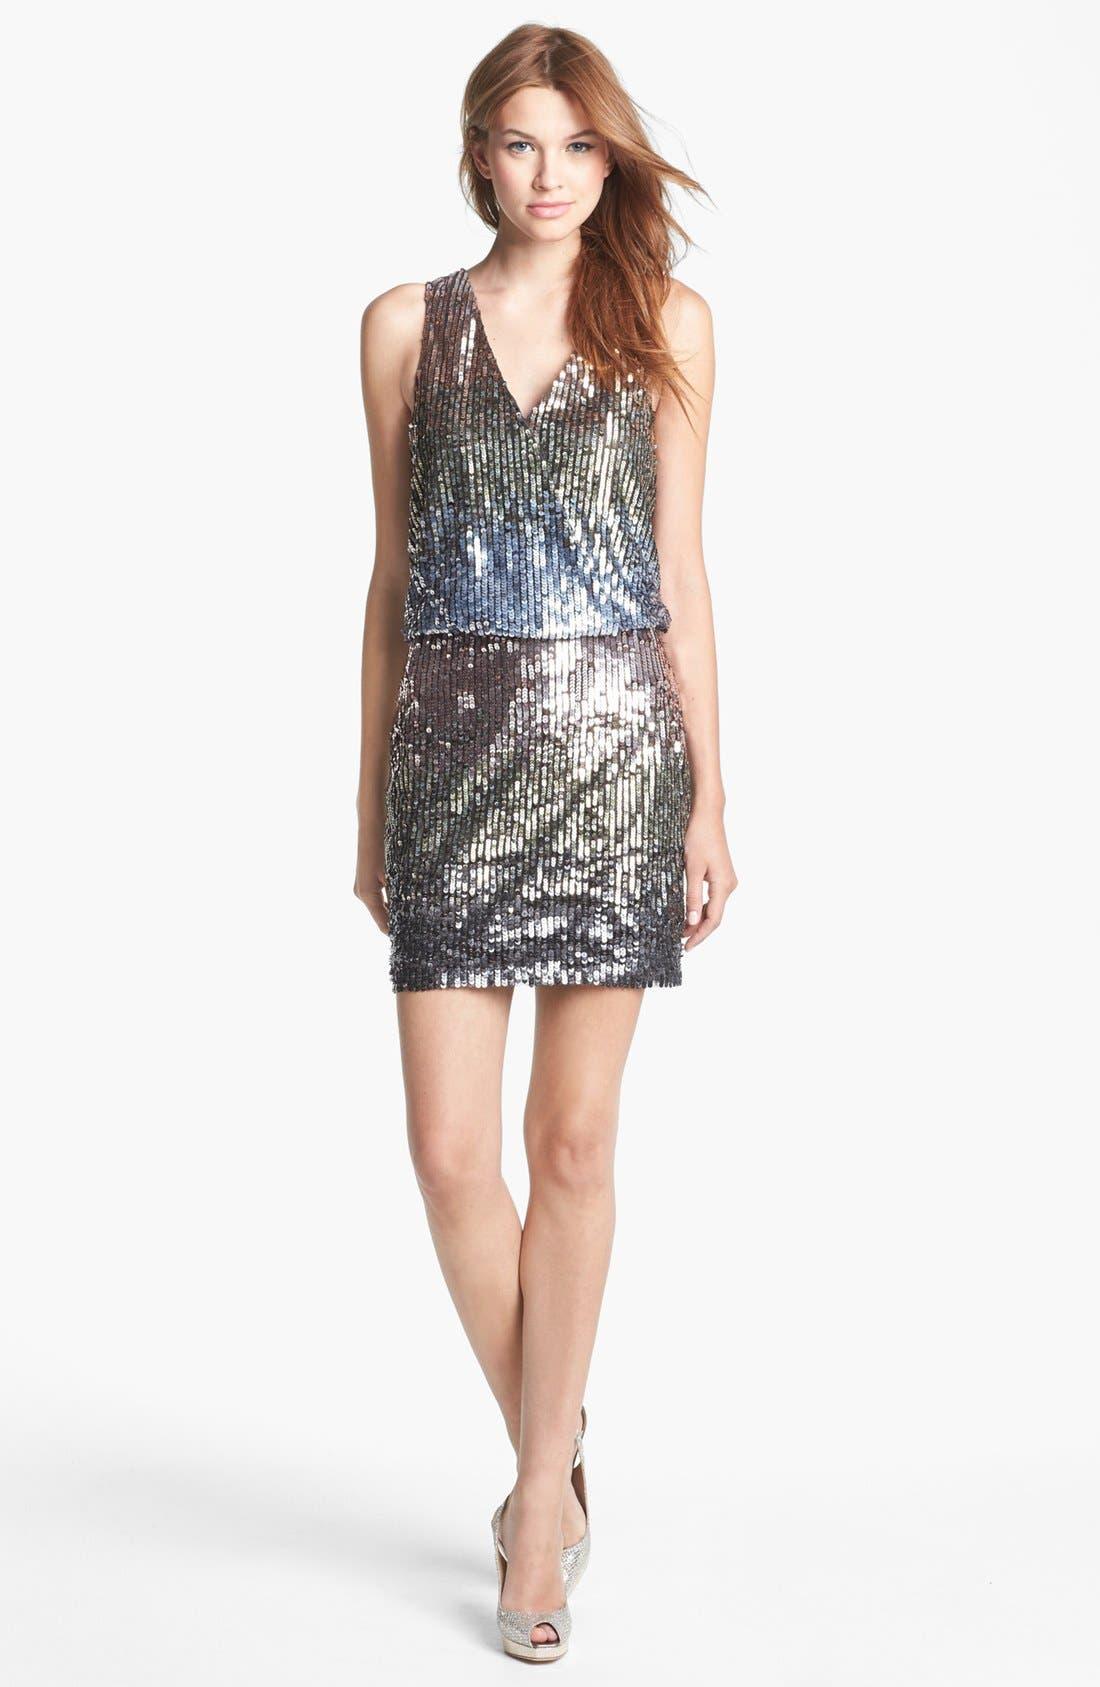 Alternate Image 1 Selected - Nicole Miller Sleeveless Ombré Sequin Dress